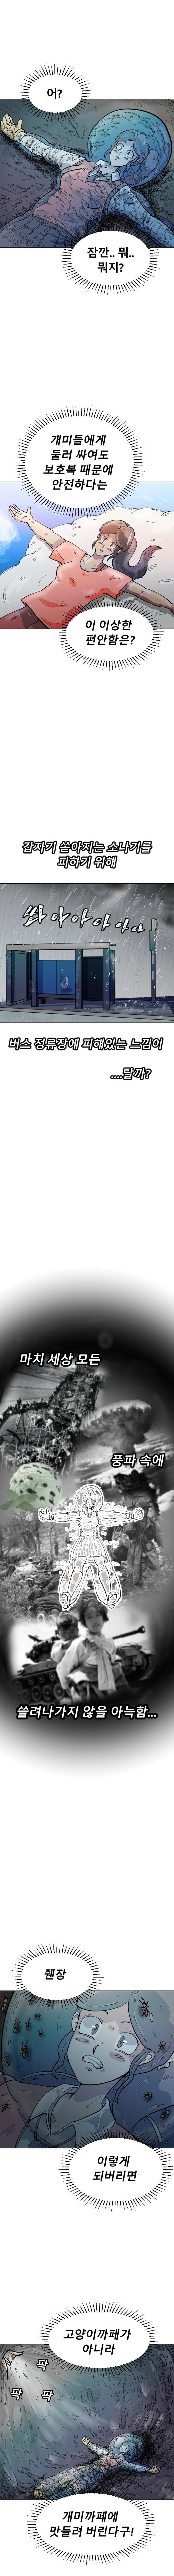 viewimage.php?id=2ebcc232eadd36&no=24b0d769e1d32ca73fed8ffa11d028317805b44c4c832ef9bd9f21ca3c35a89ddfcad1492072961c80ee12f8b26cf612f42f505fb8d930e9edbd98c3a801994490d62d